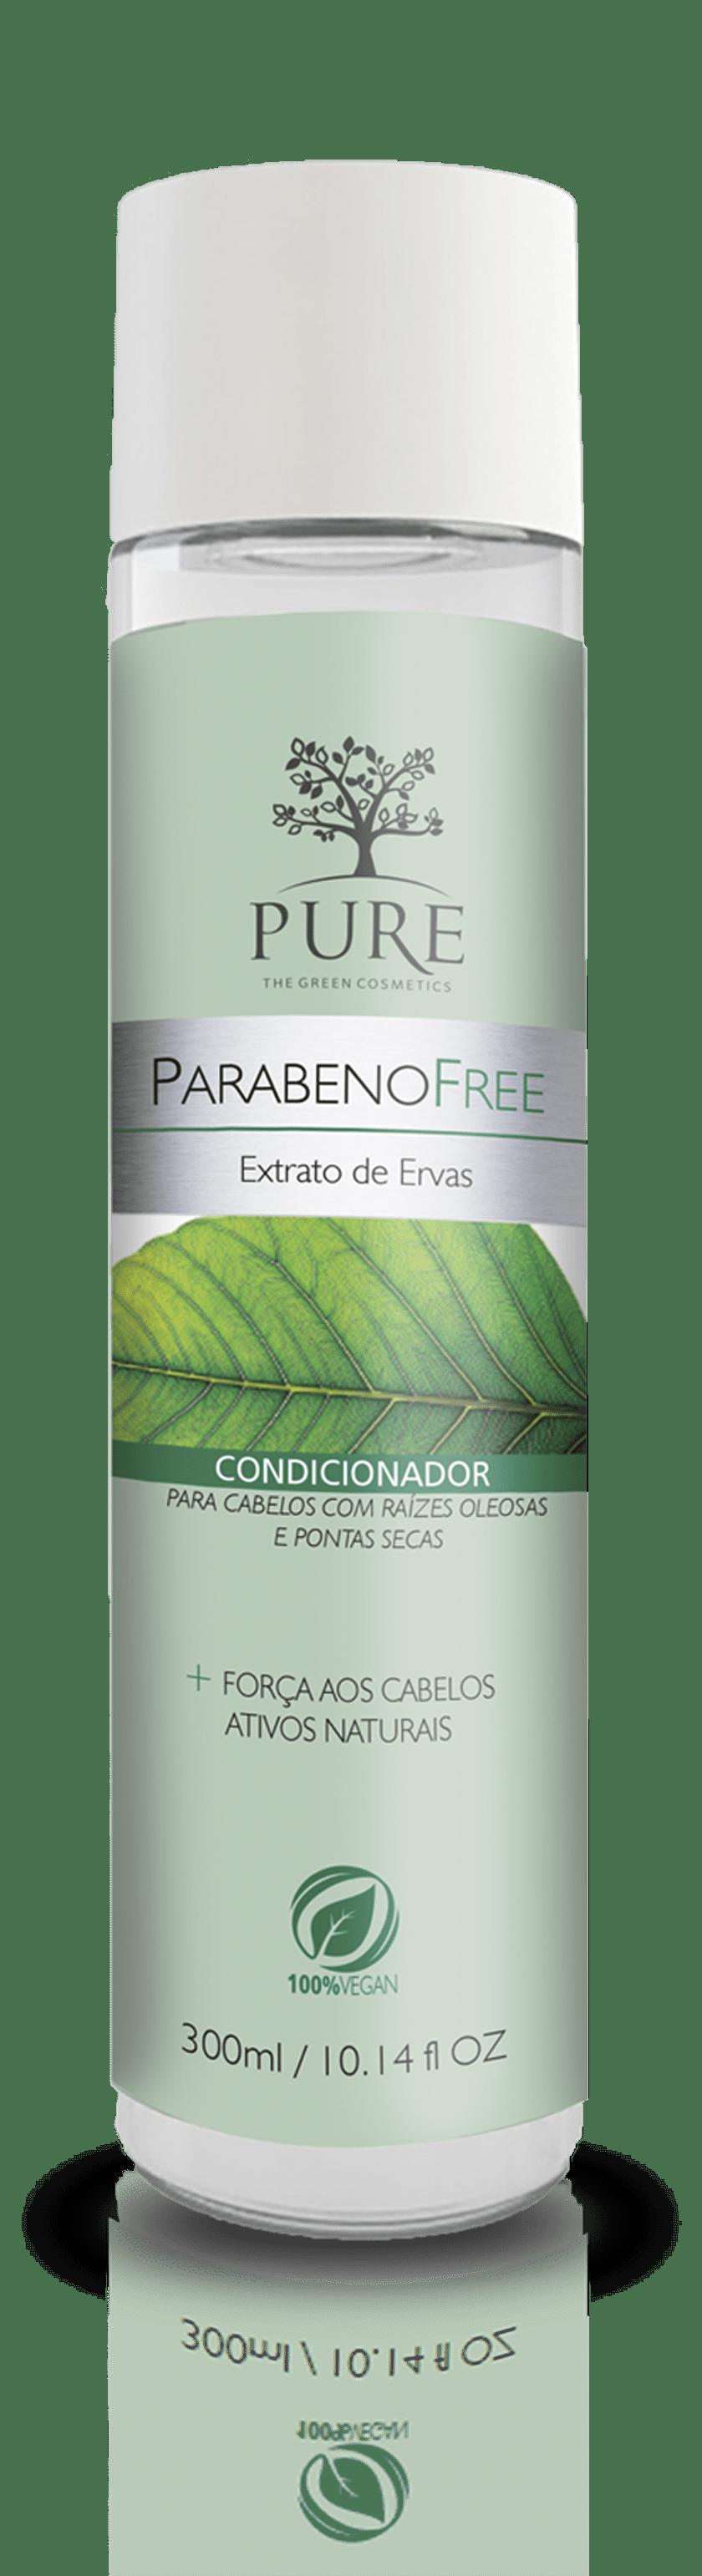 Pure Extrato de Ervas Parabeno Free Condicionador Fortificante - 300ml